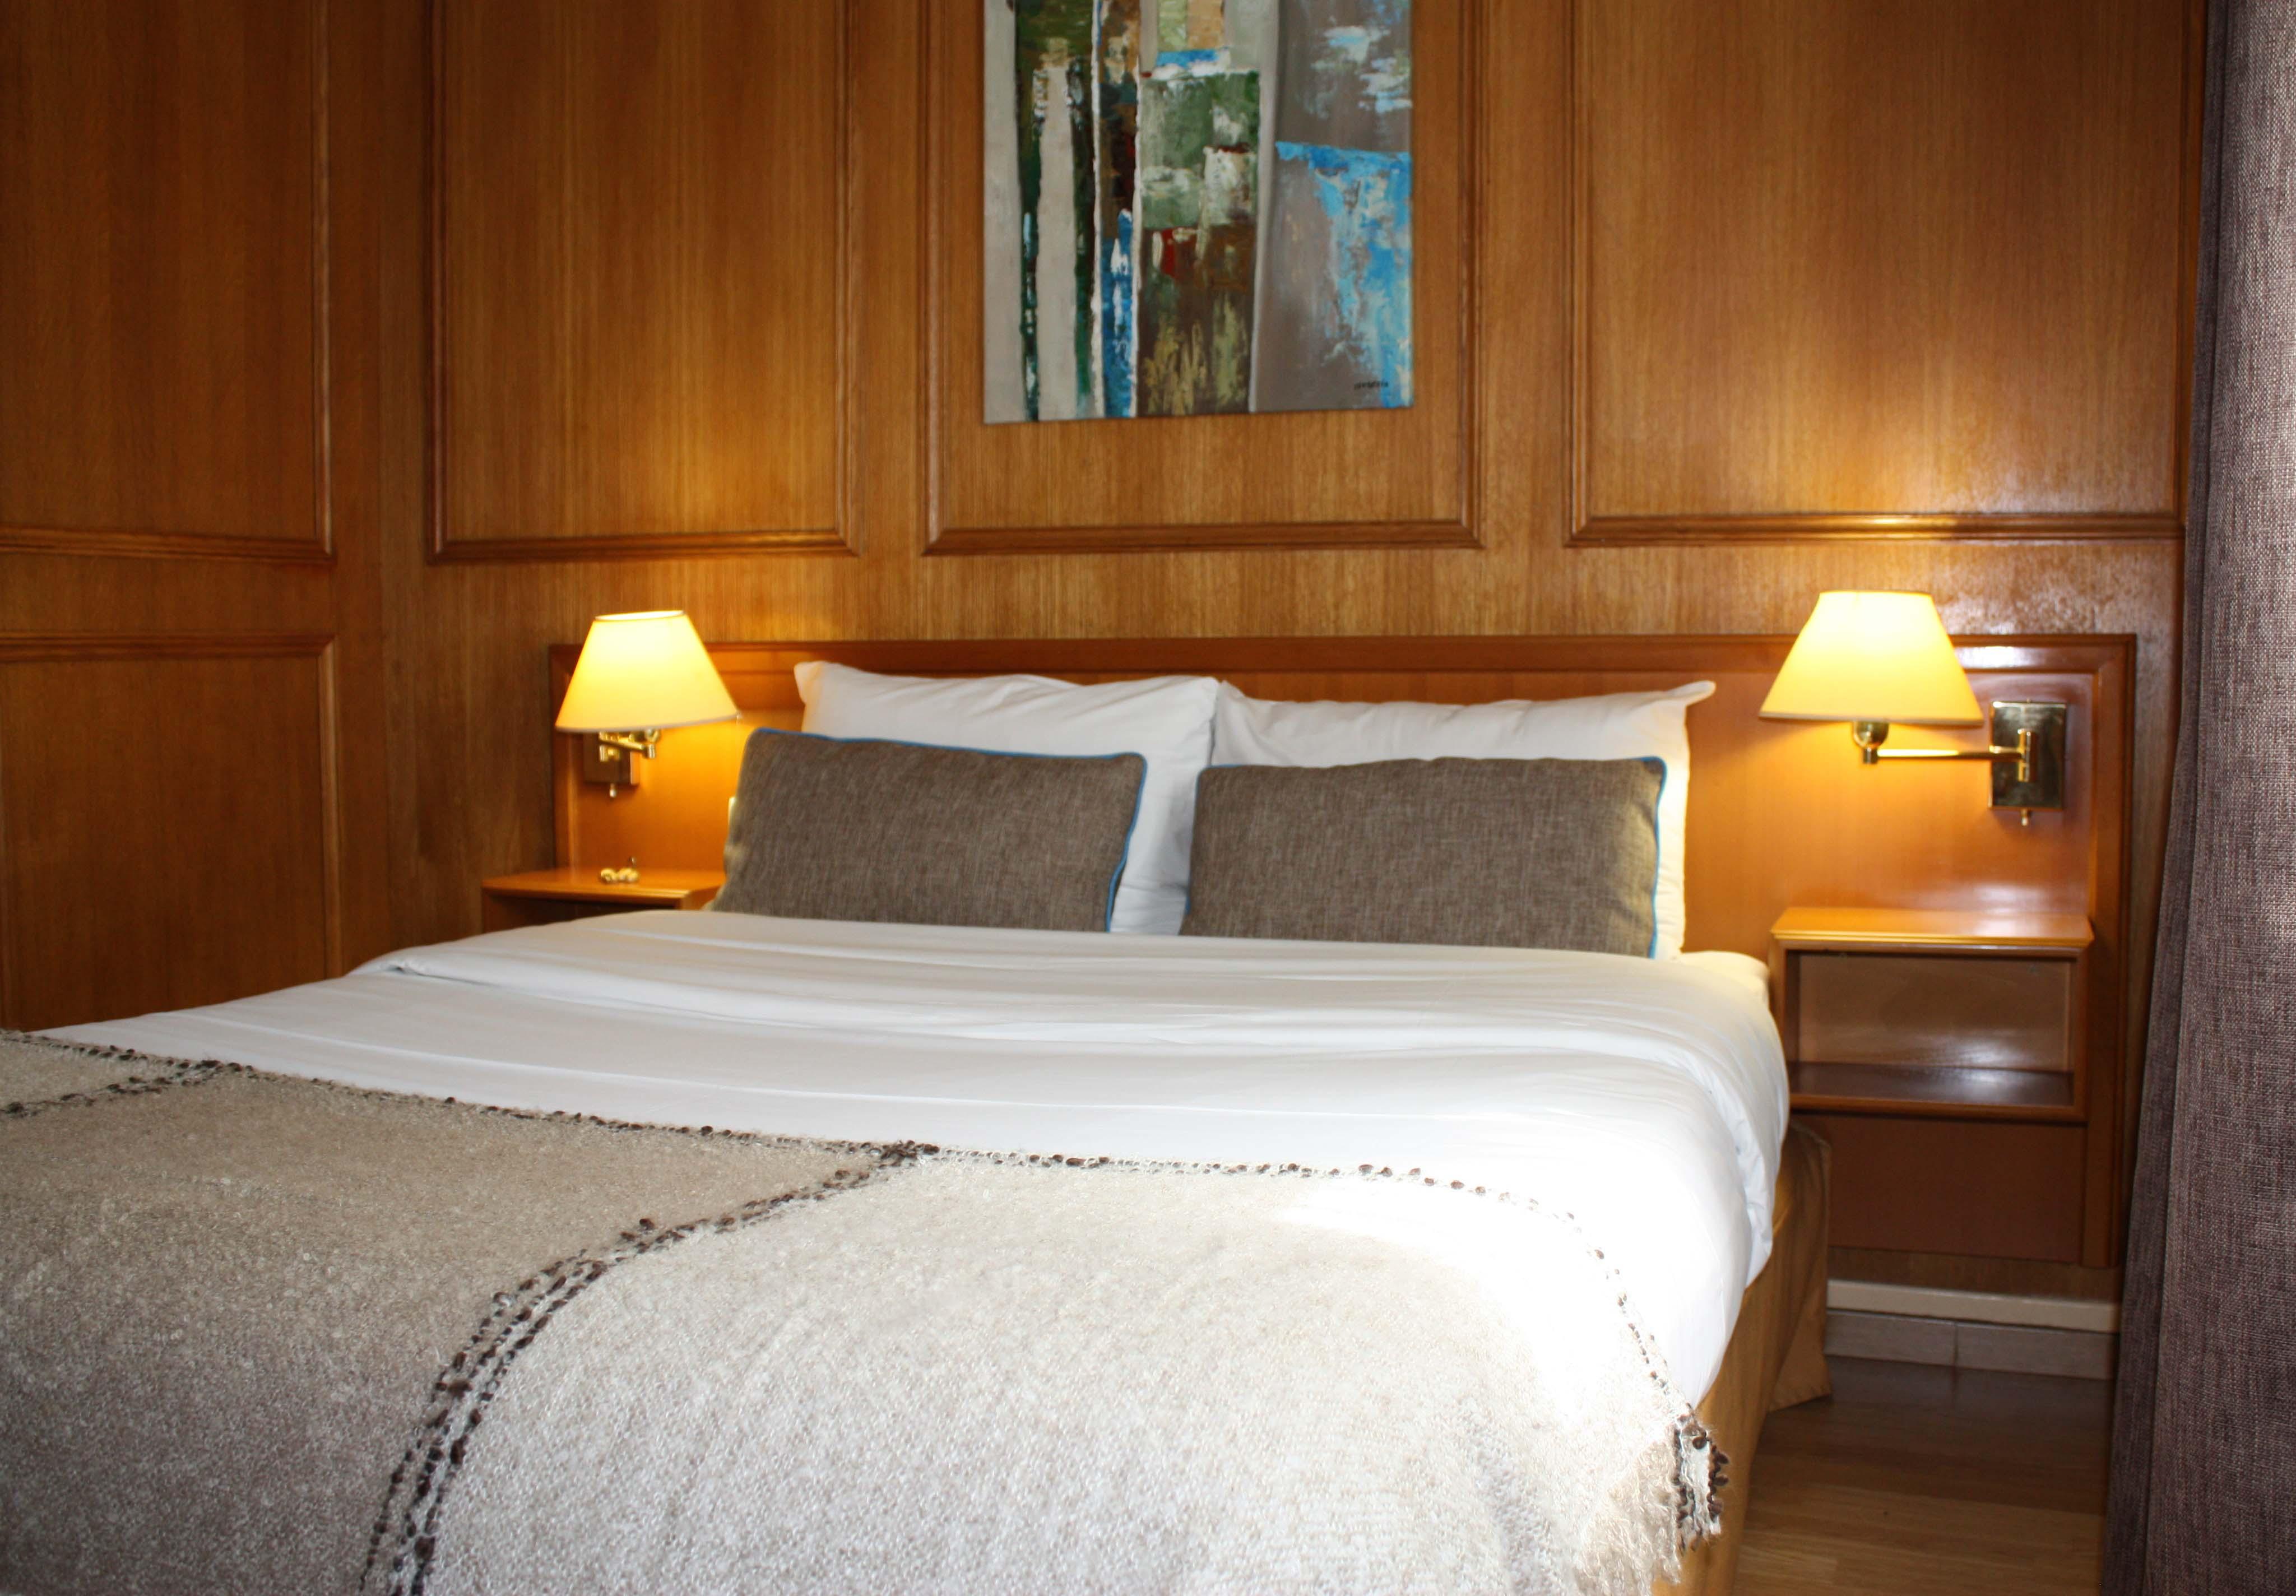 hoteldauphinputeaux1